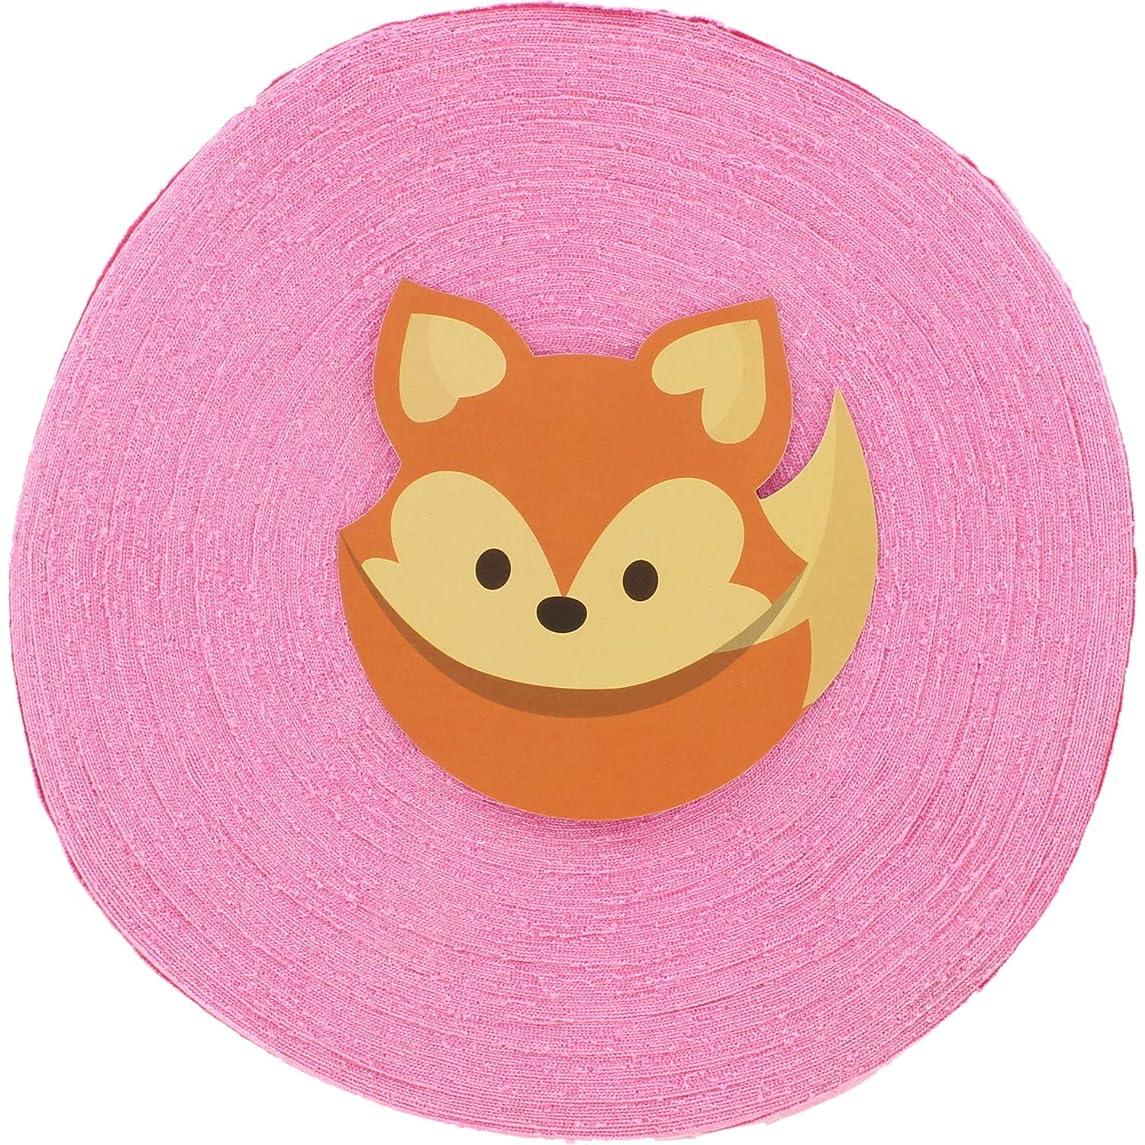 T-Shirt Yarn Lightweight Fabric Disc - Fettuccini Zpagetti Style Yarn Ball for DIY Crocheting, Sewing & Knitting - ?3/4 lbs (350g) | 65 Yards (~60 Meter)